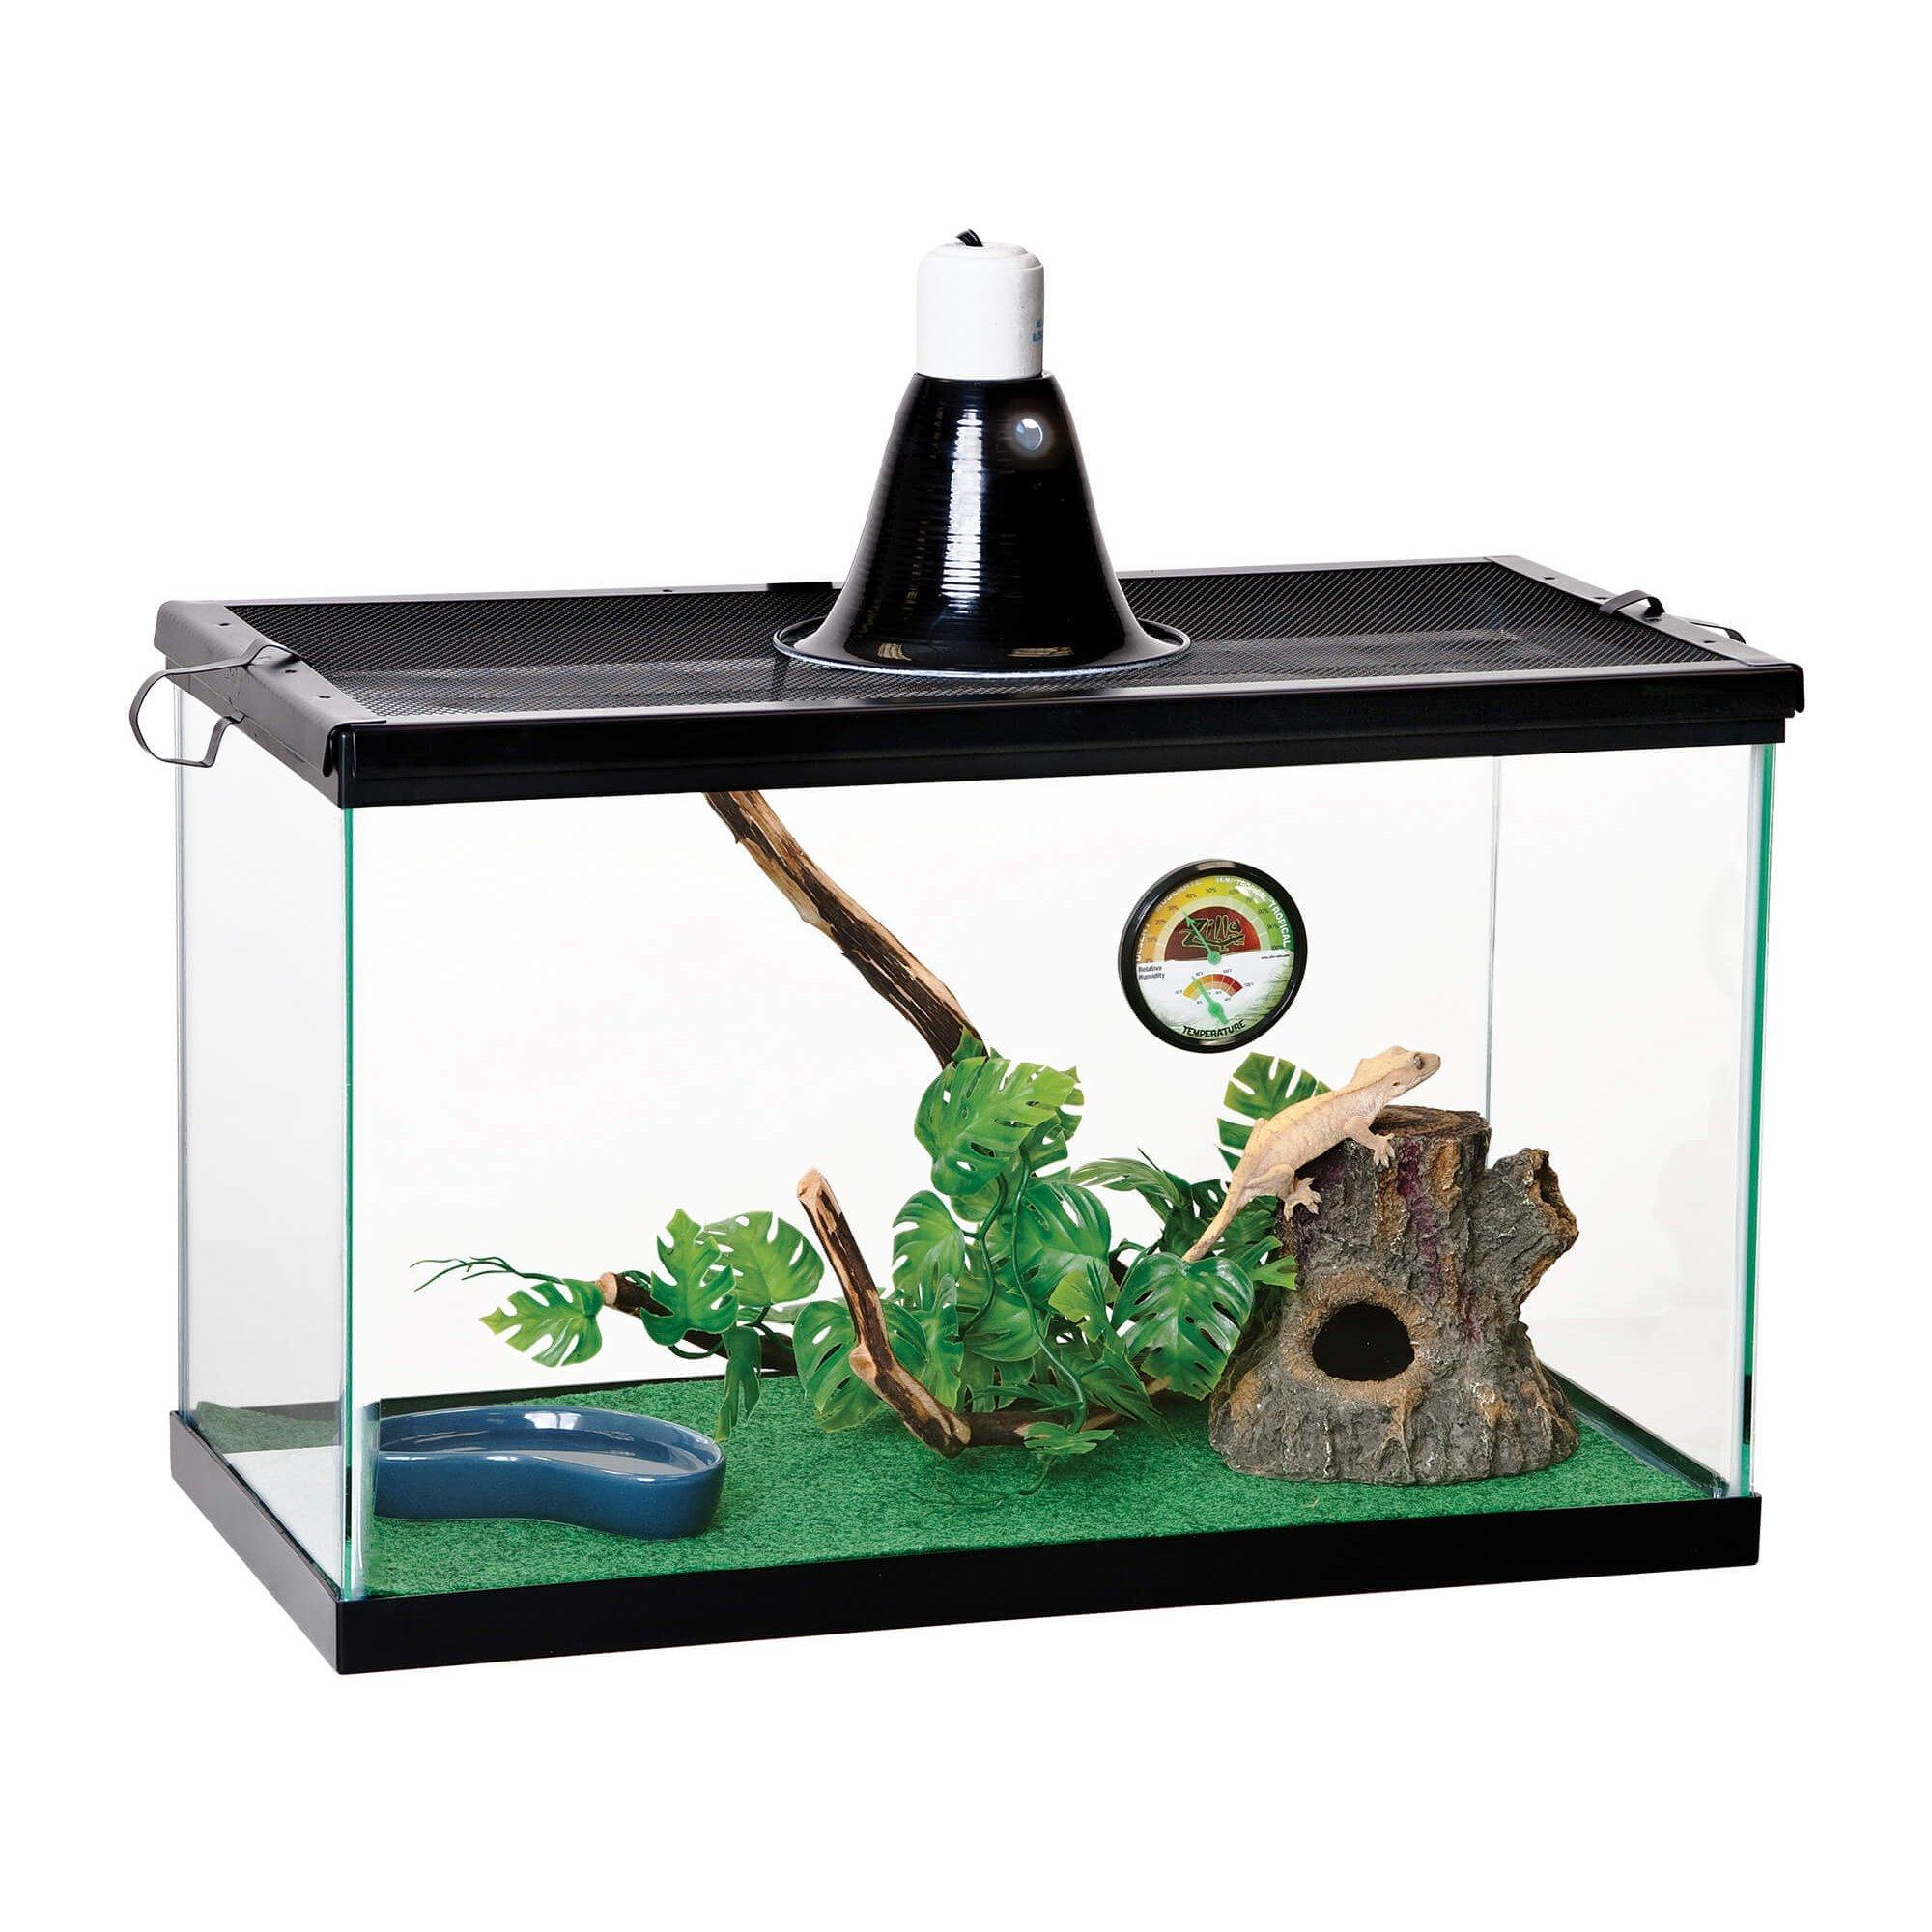 Vertical Tropical Terrarium Kit